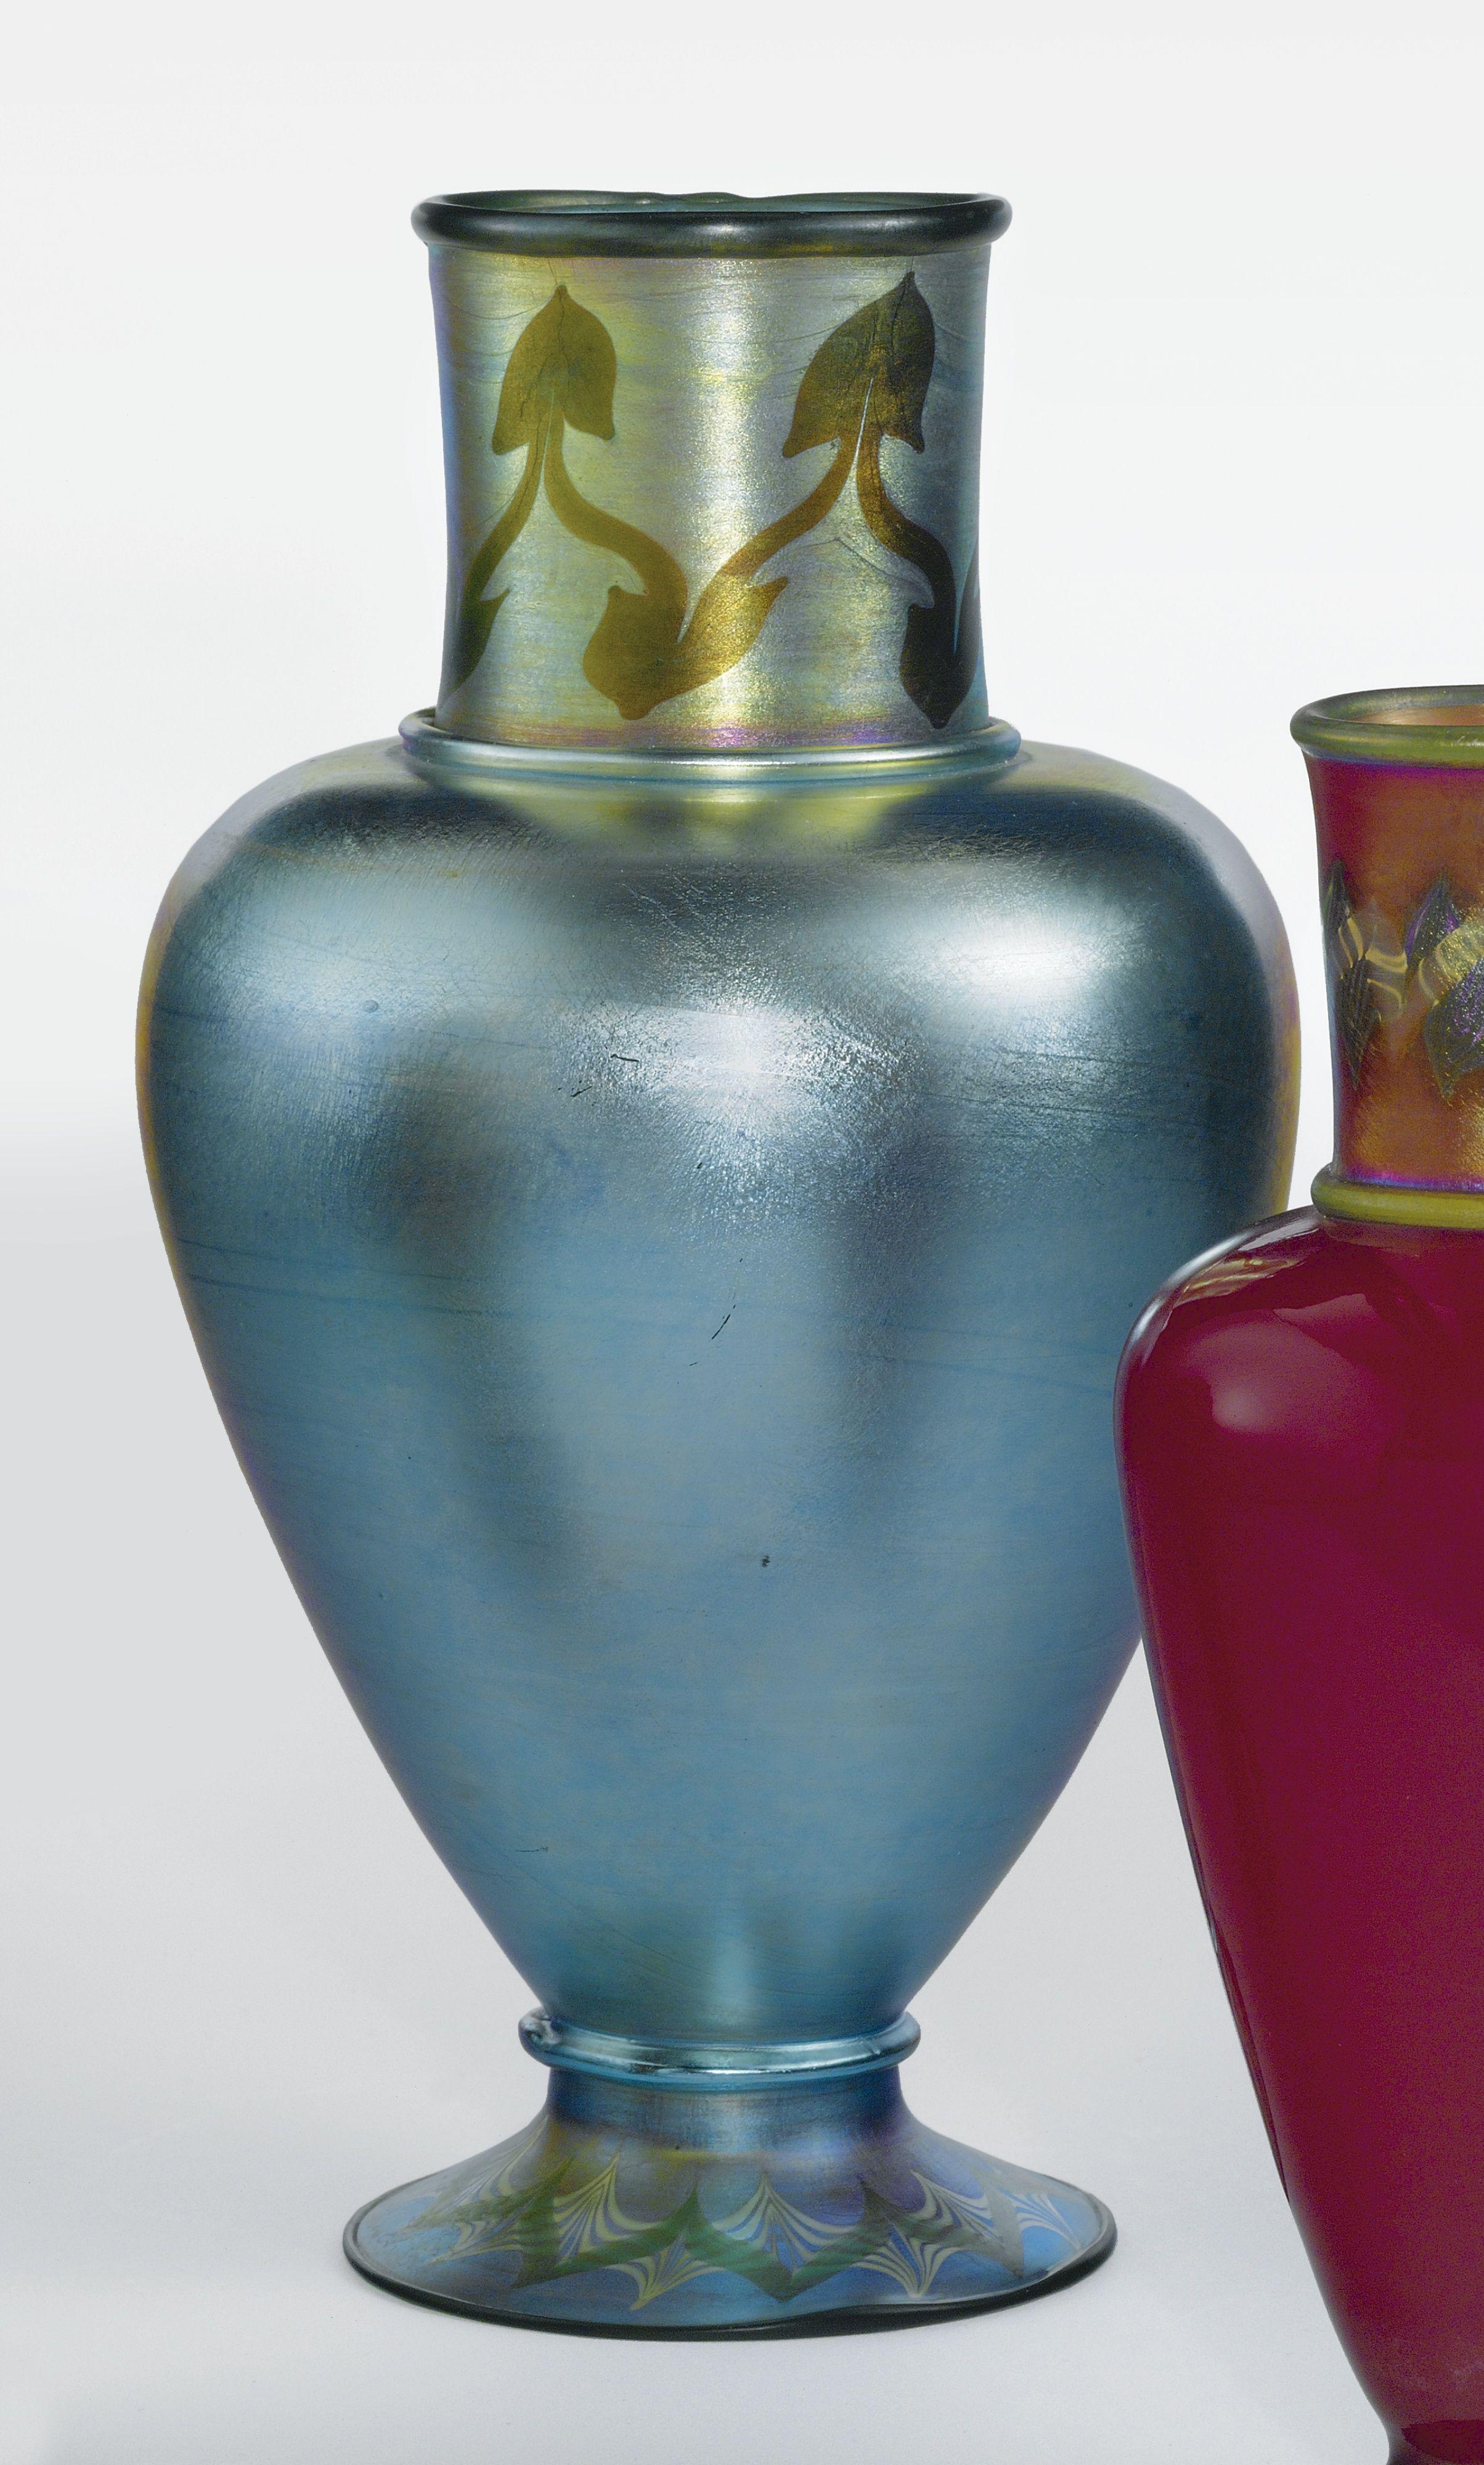 "Tiffany Studios I ""Tel-El-Amarna"" Vase I Engraved L.C. Tiffany I Favrile glass I ca. 1911-1912"